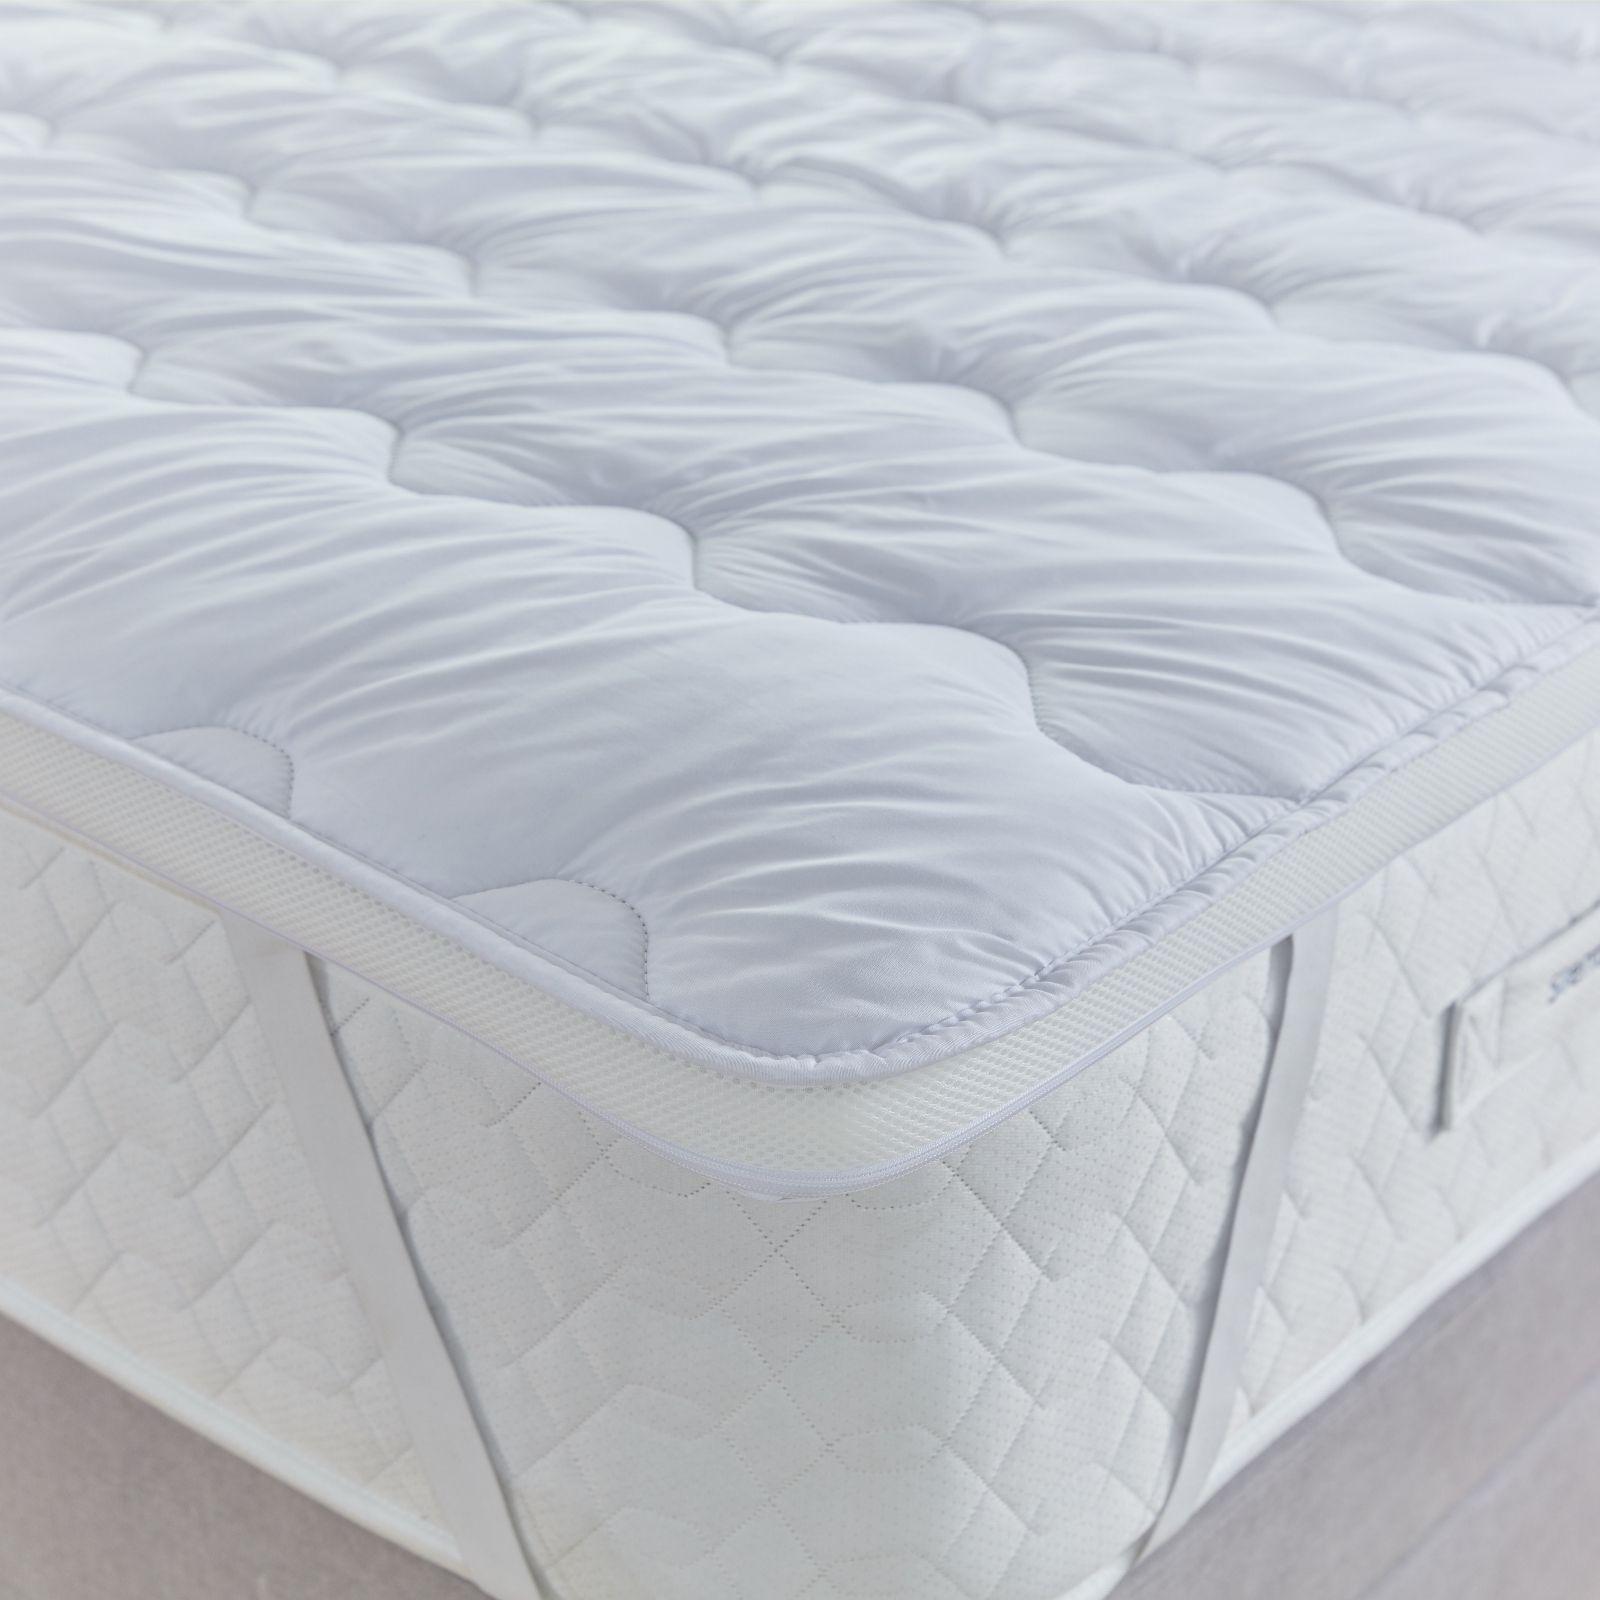 Orthopedic Anti Allergy Air Flow Mattress Topper Dual Air Mesh Hotel Deep Filled